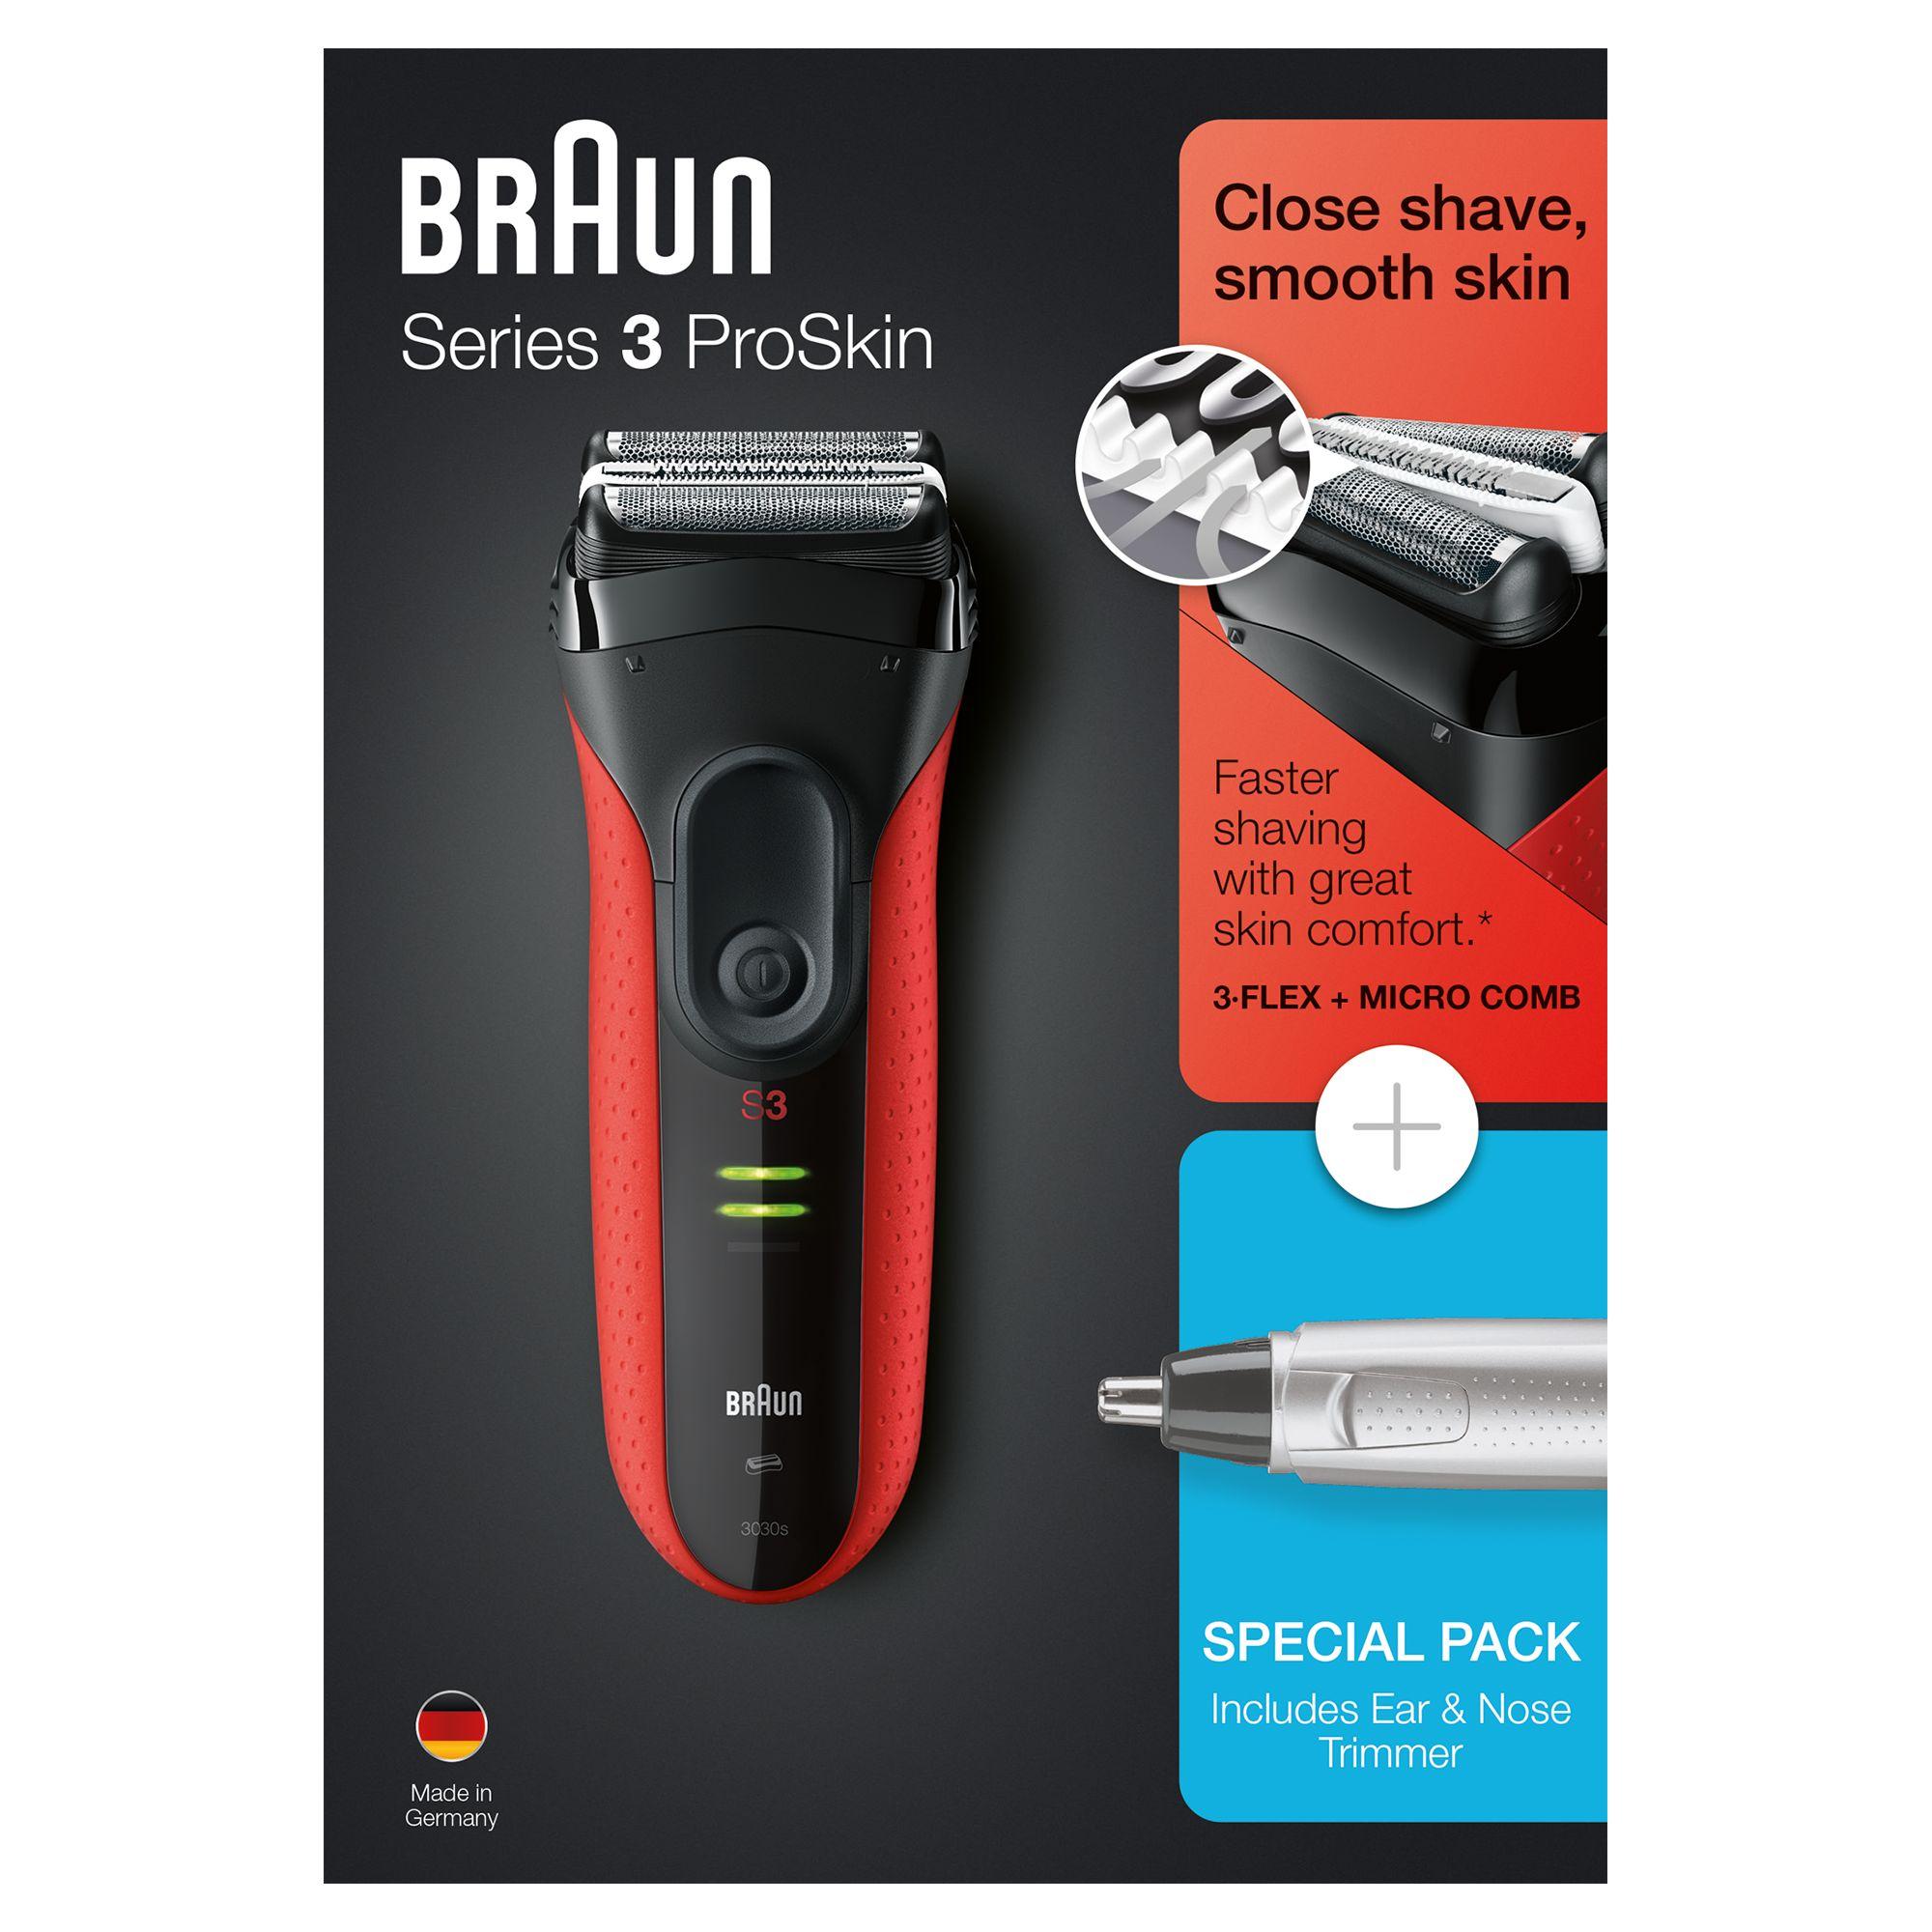 Электробритва Braun Series 3 ProSkin 3030s + Триммер Ear&Nose EN10 цена и фото